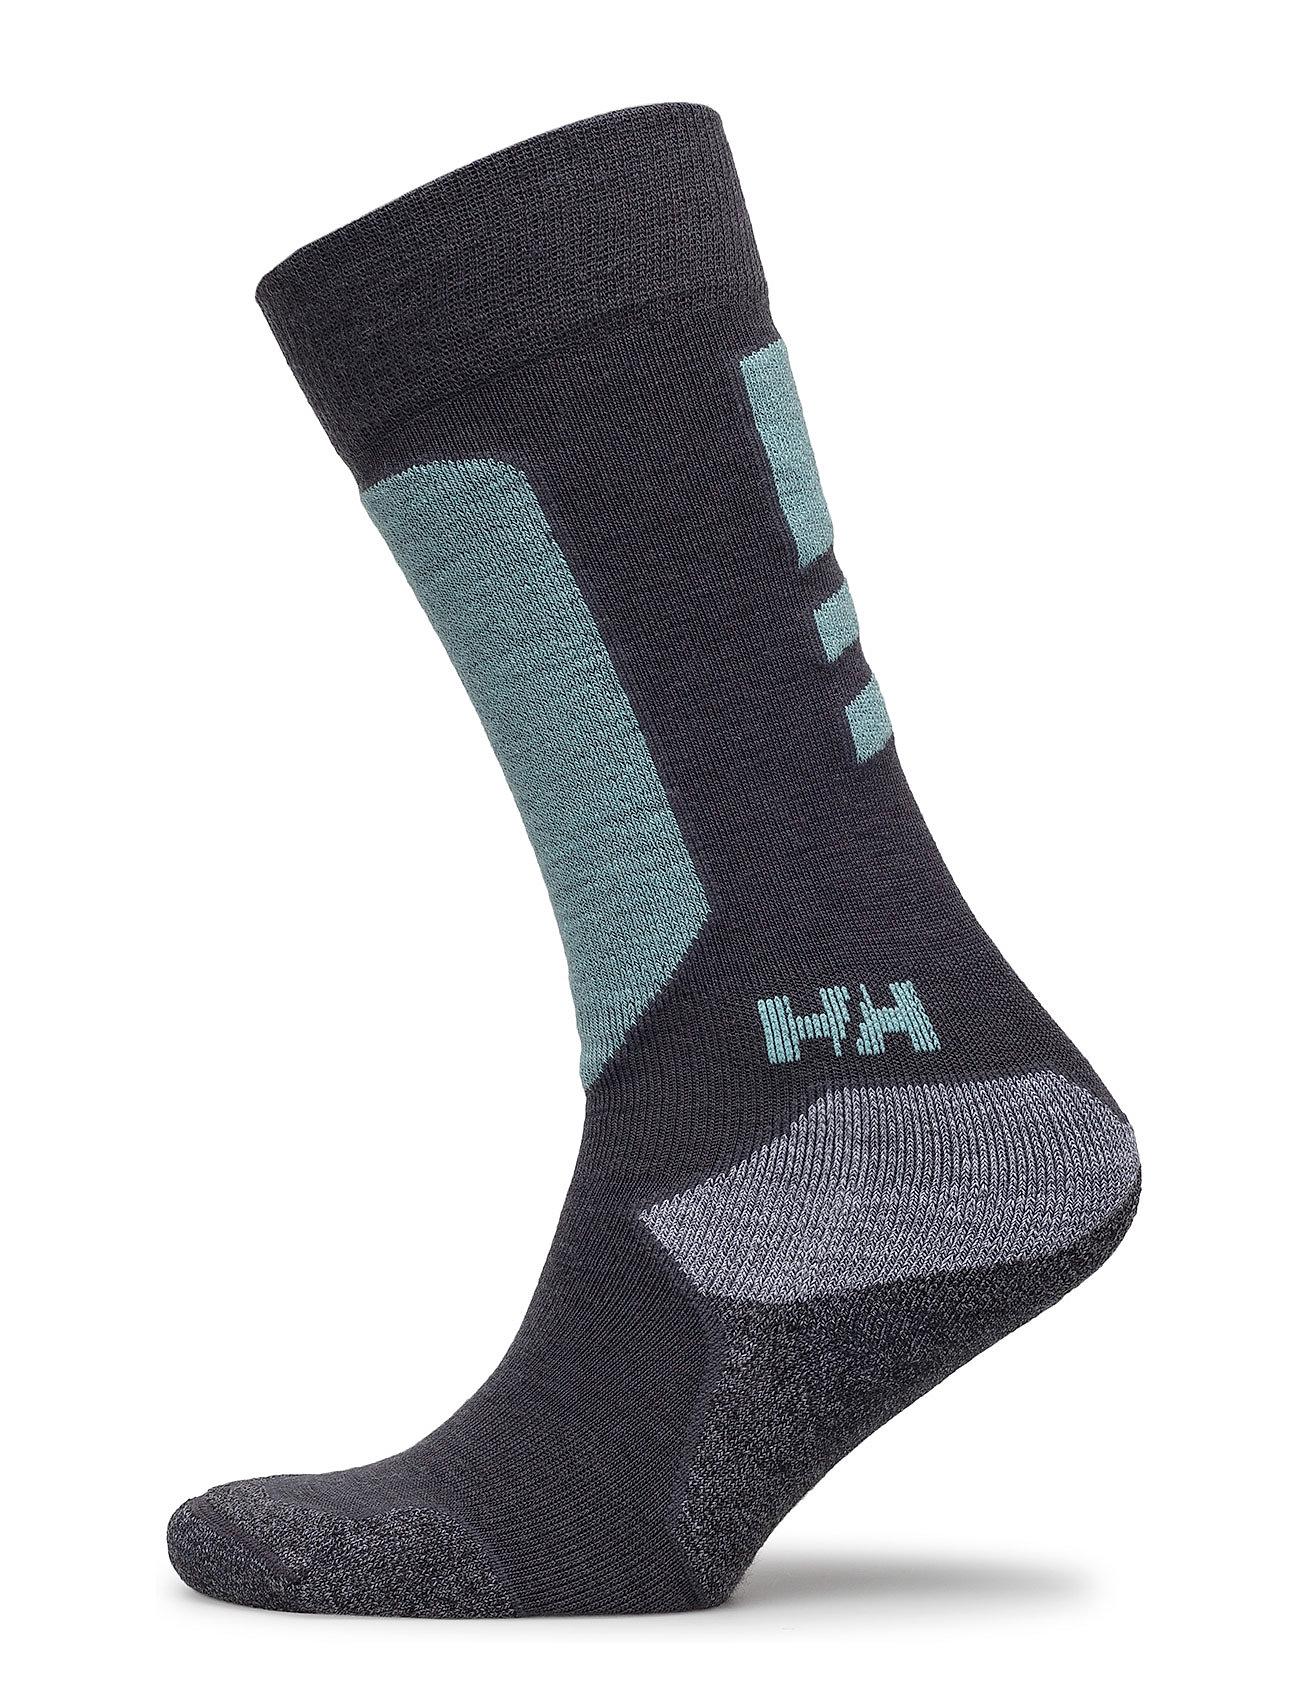 helly hansen – W hh lifa merino black alpine fra boozt.com dk